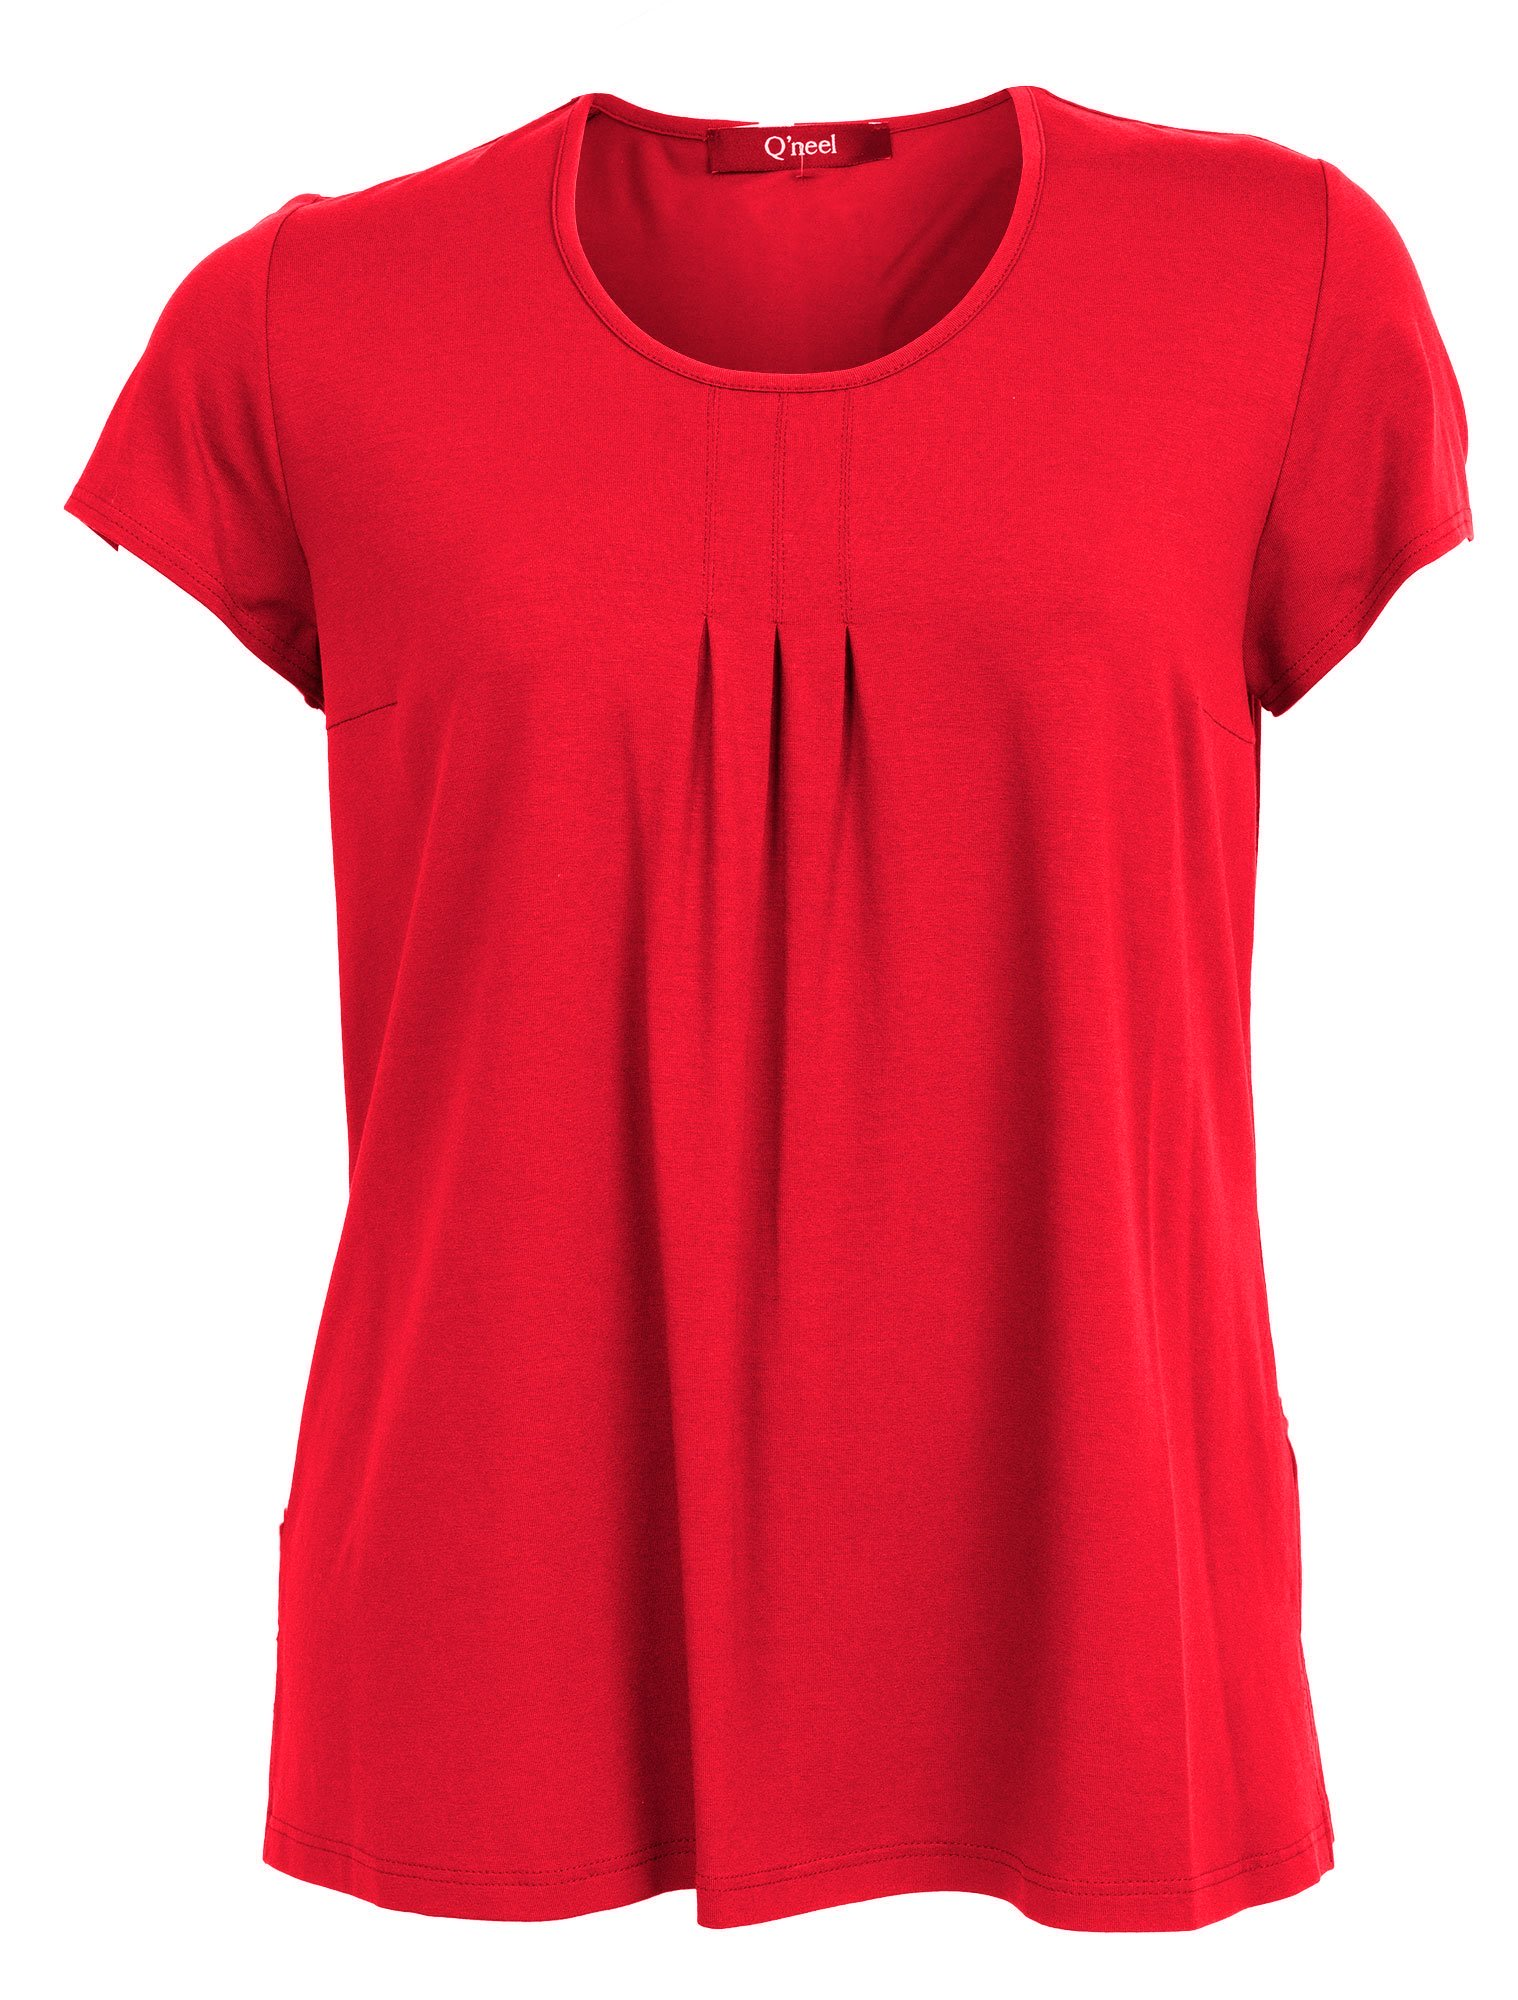 Basis t-shirt i flot rød farve